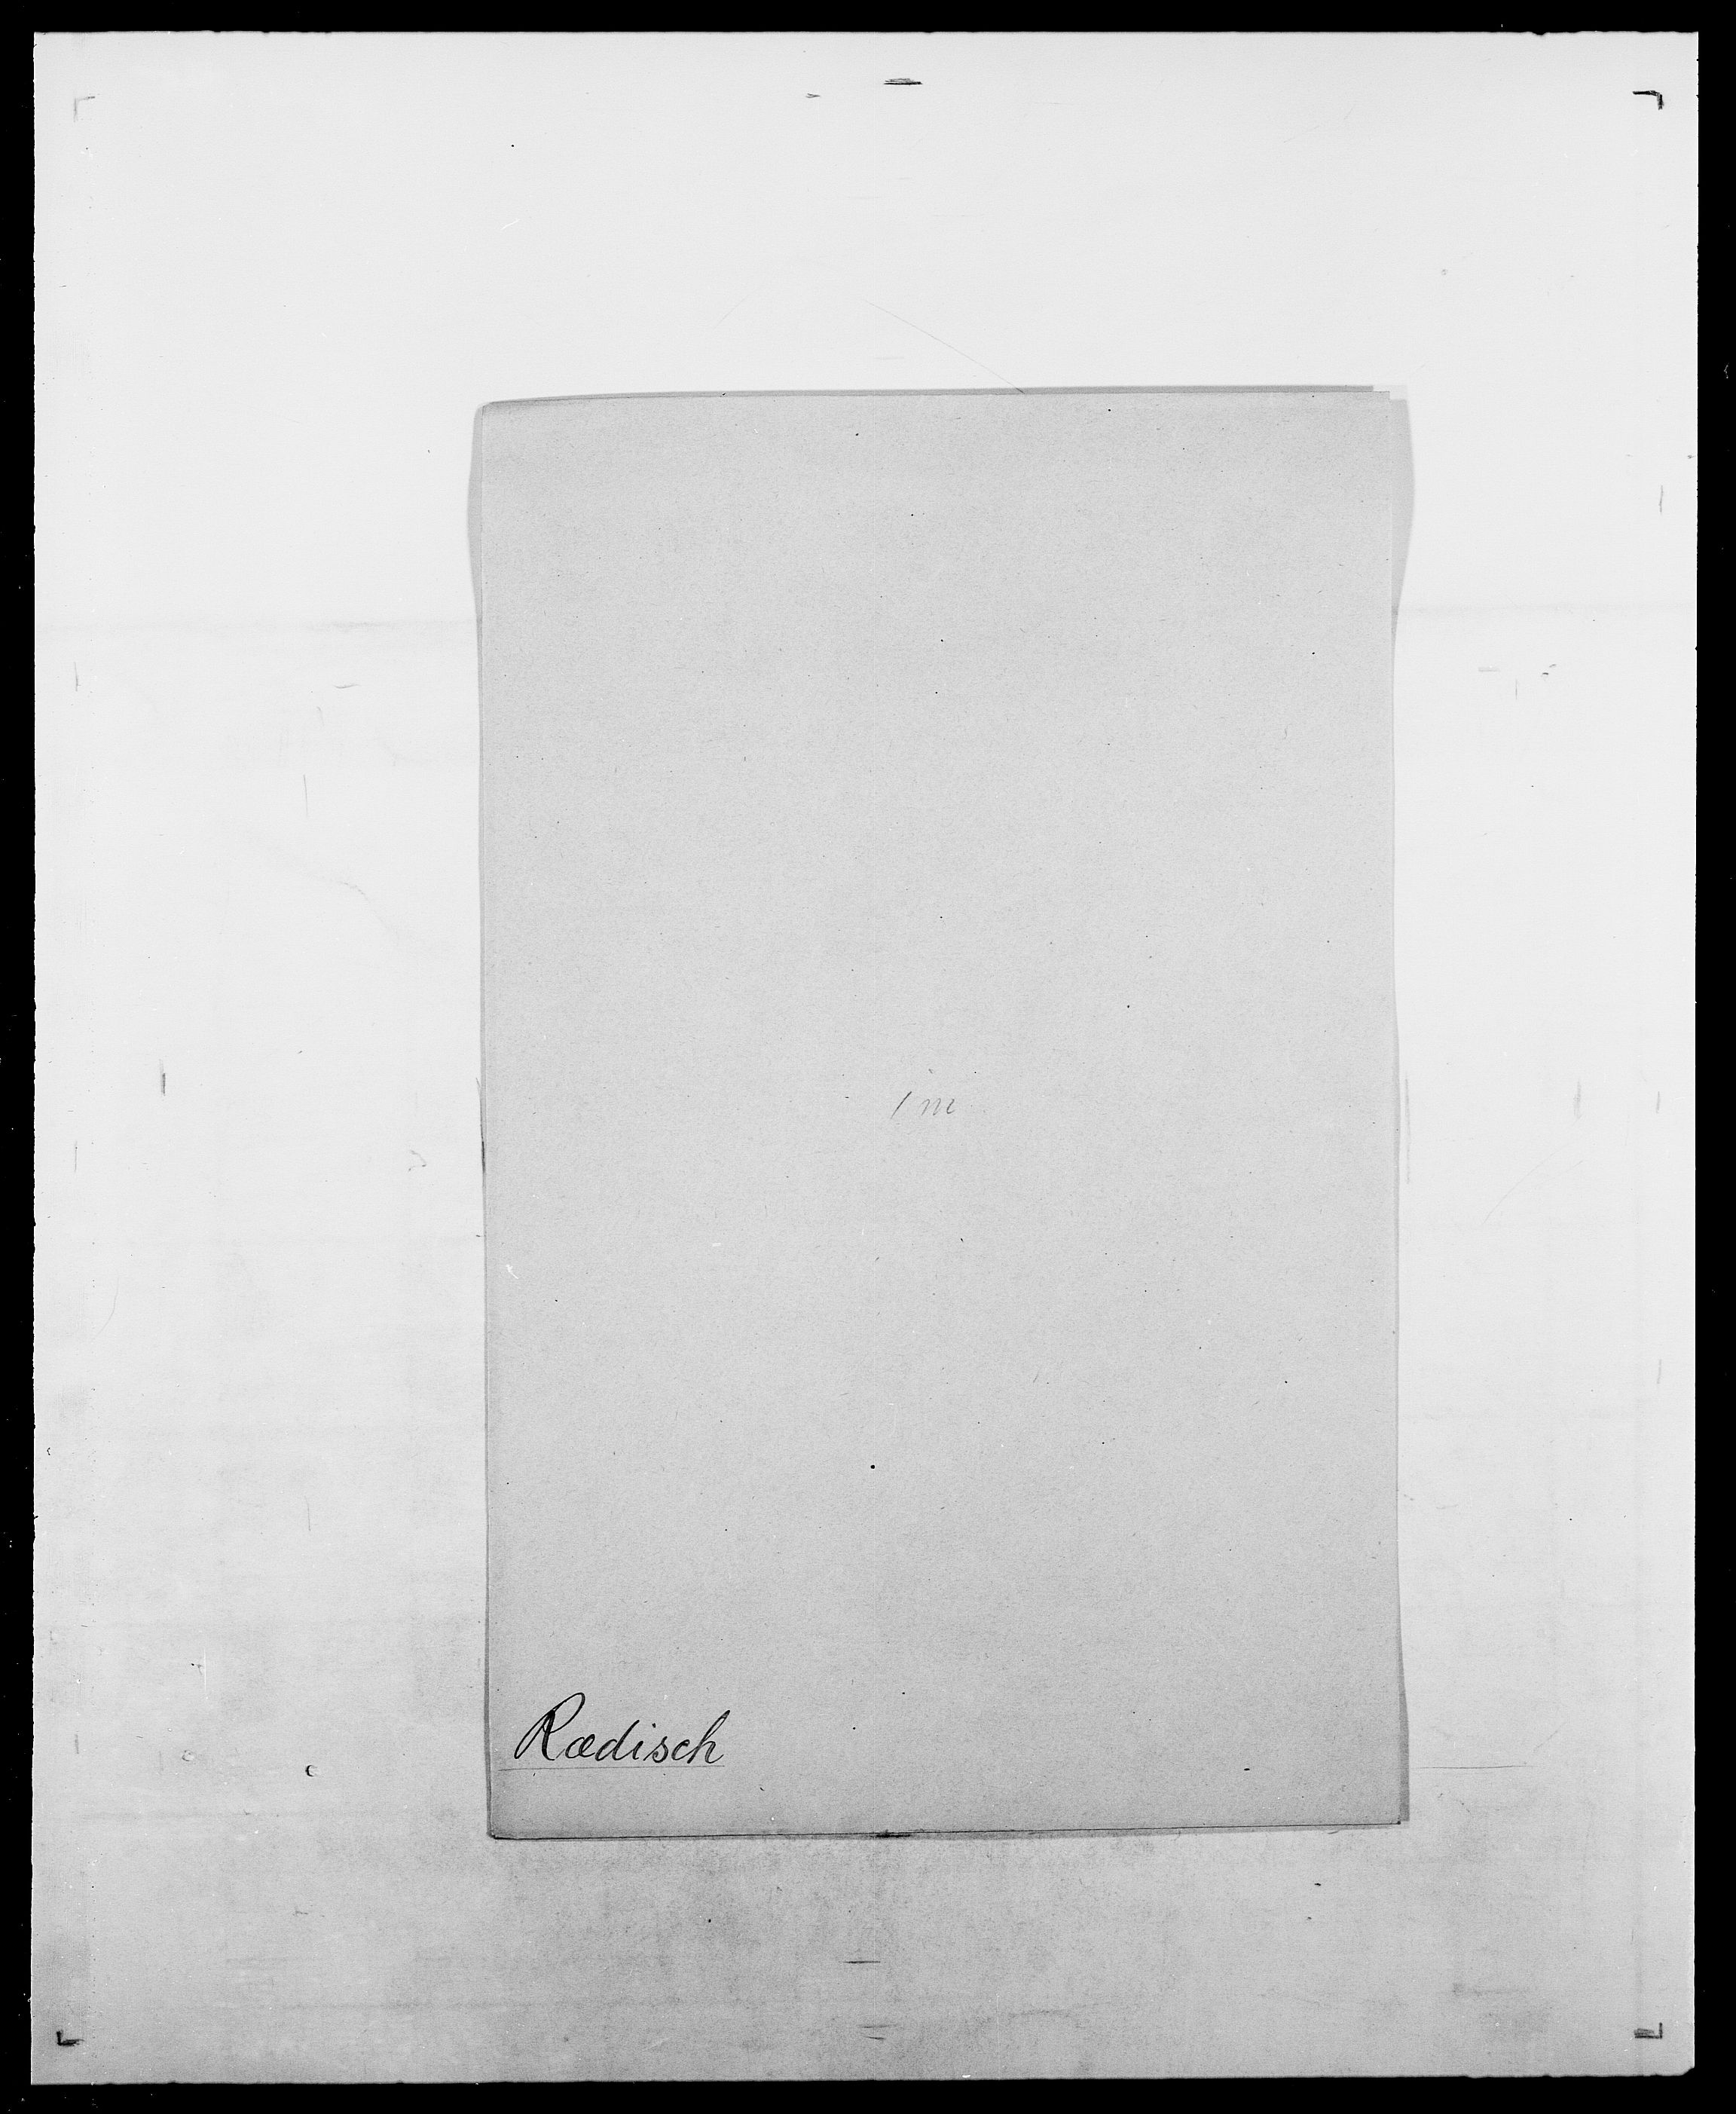 SAO, Delgobe, Charles Antoine - samling, D/Da/L0033: Roald - Røyem, s. 616